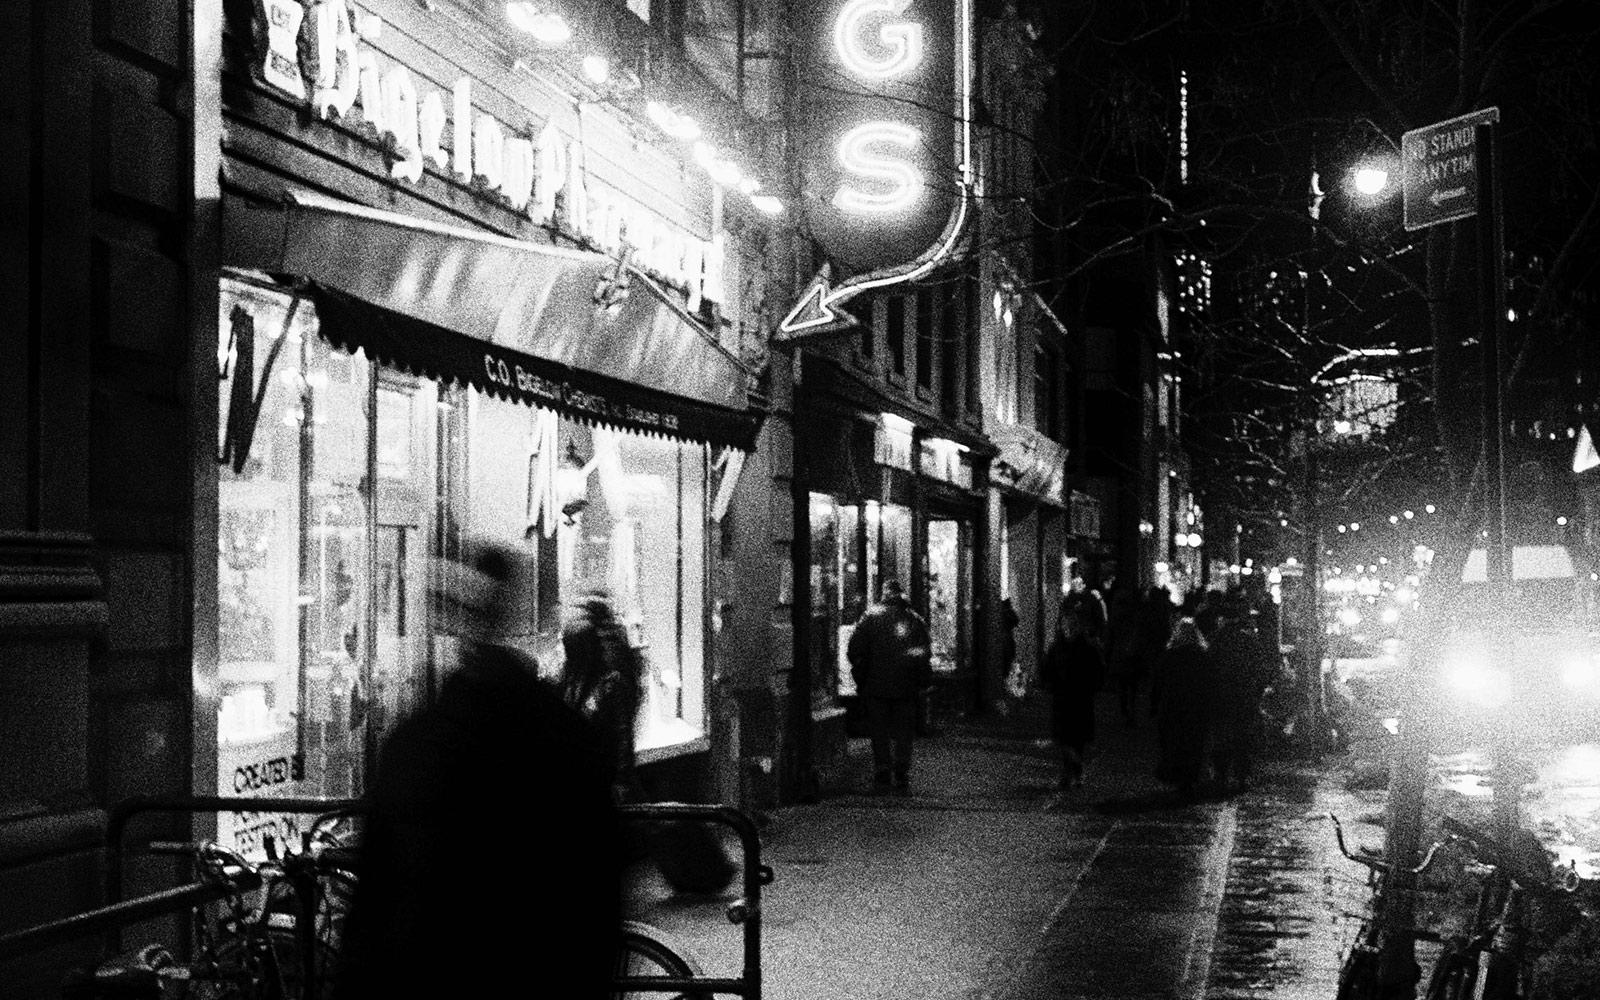 Sixth Avenue in Greenwich Village, 2014